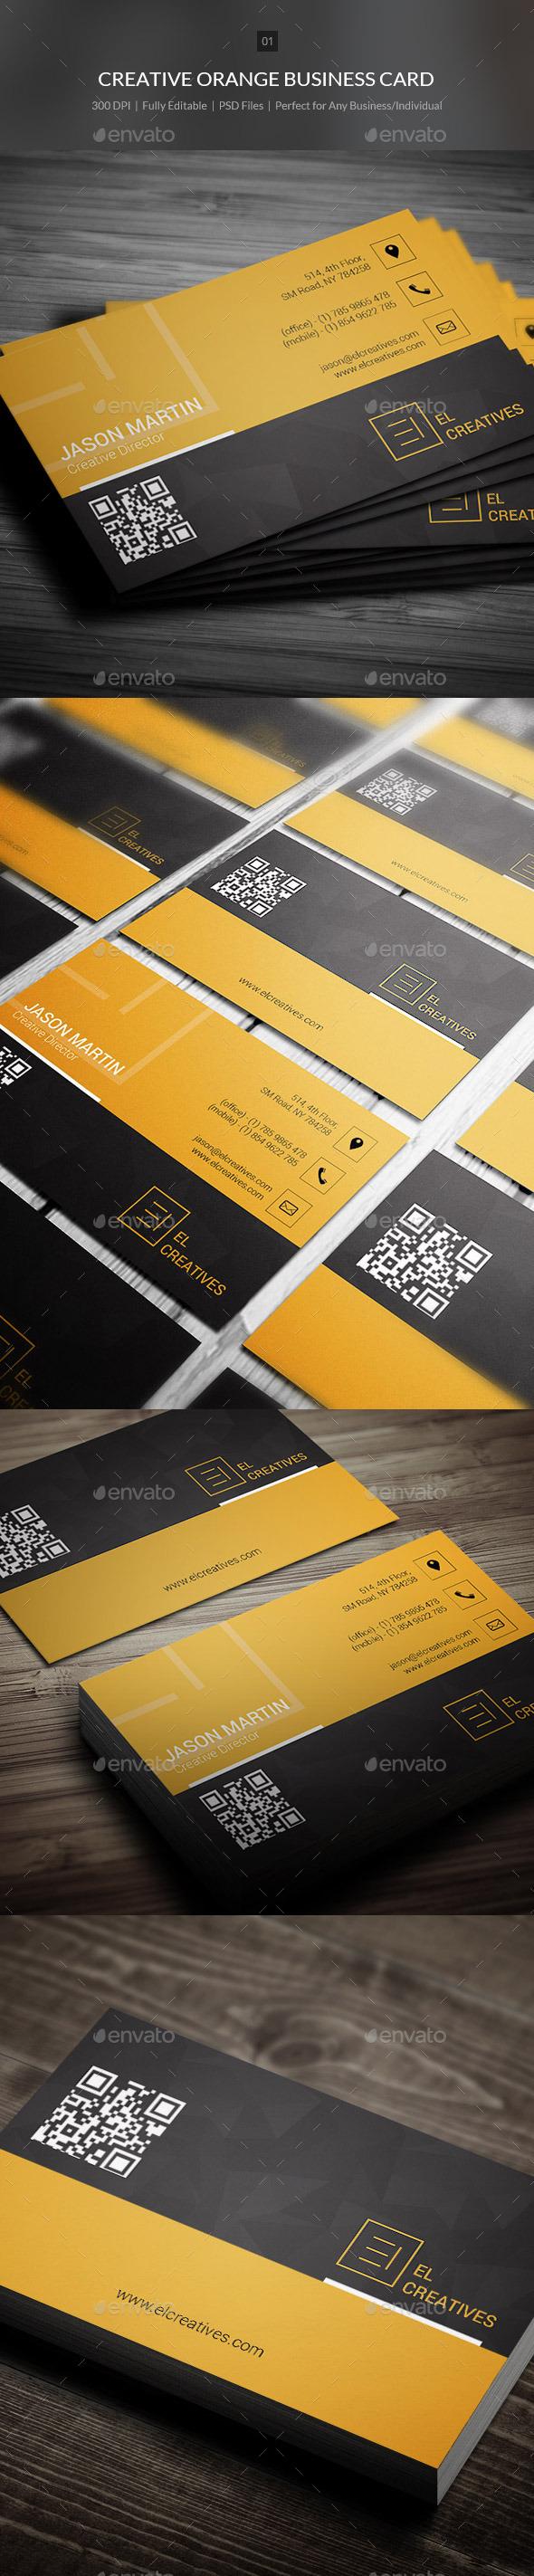 GraphicRiver Creative Orange Business Card 01 10603046